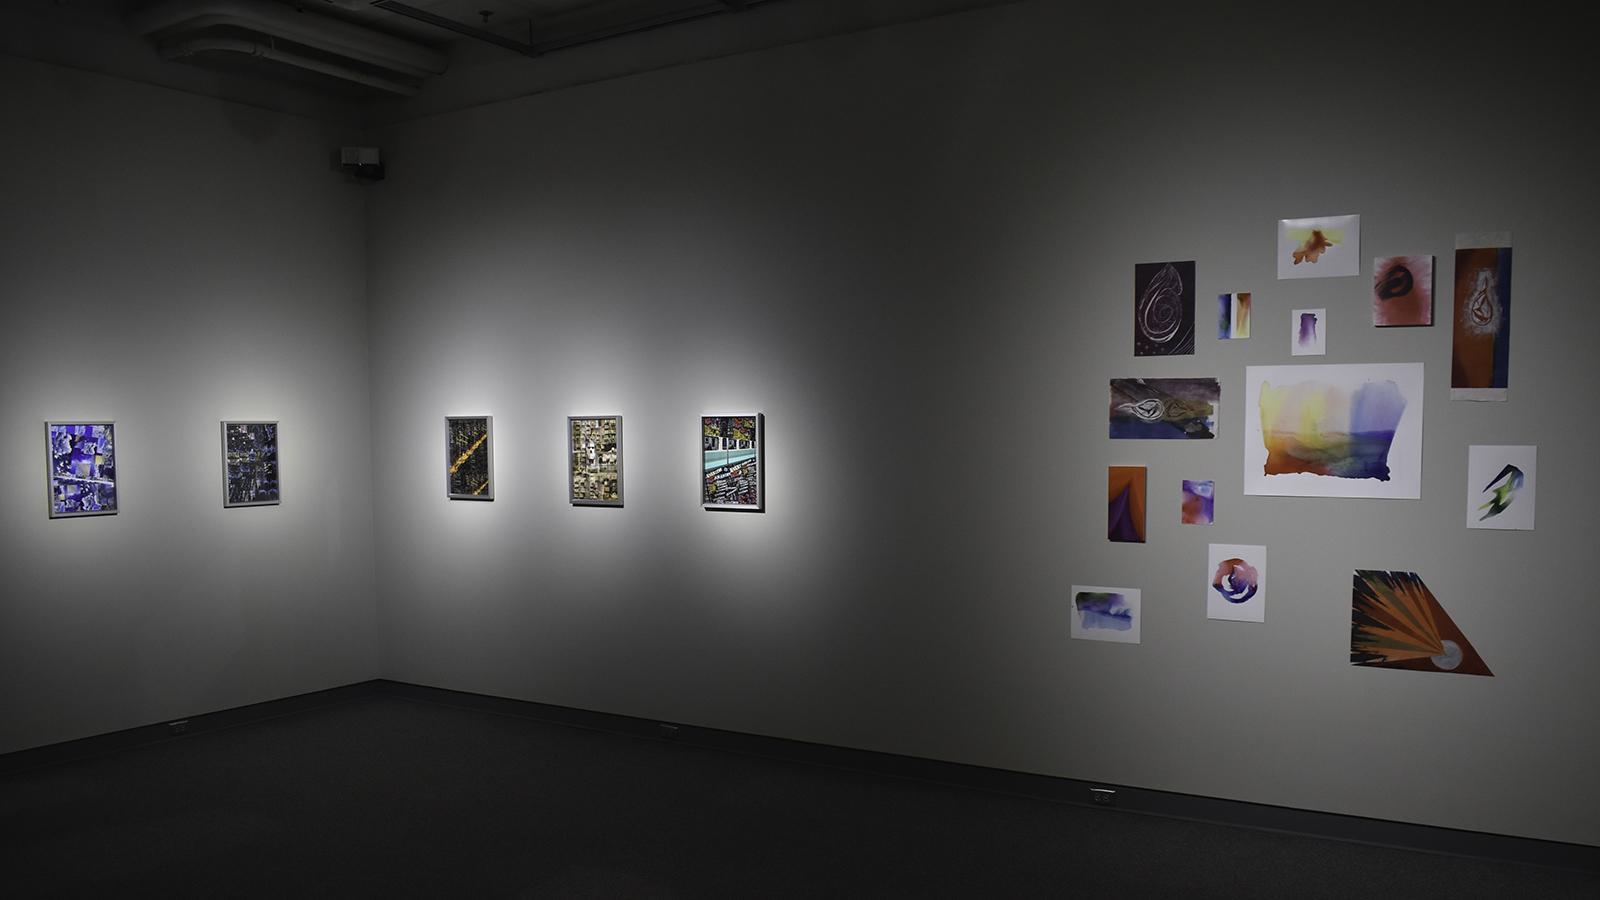 Gallery Capstone Promo Image